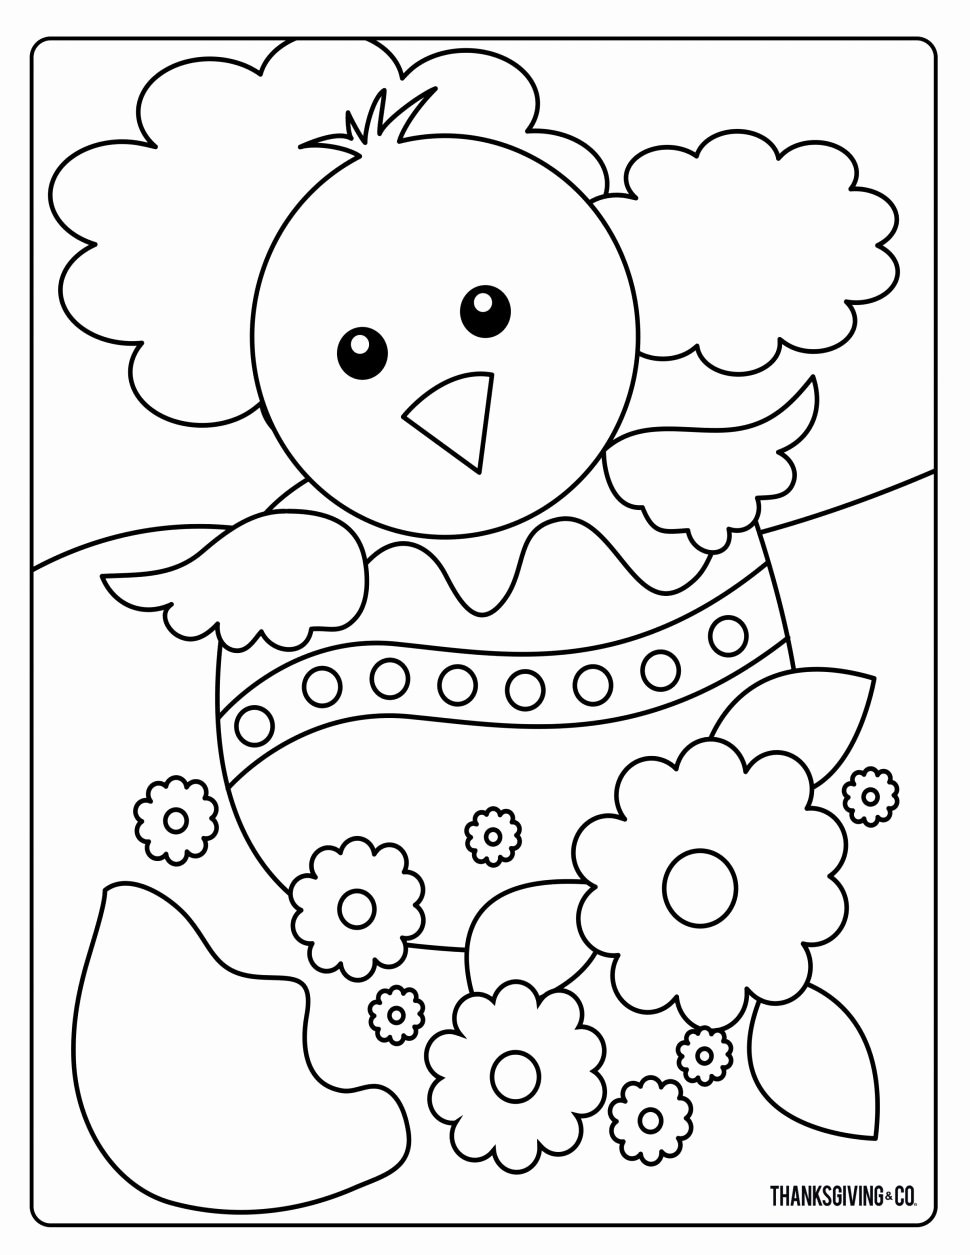 Coloring Worksheets for Preschoolers Inspirational Worksheet Coloring Pages Tracing Worksheets for Preschool